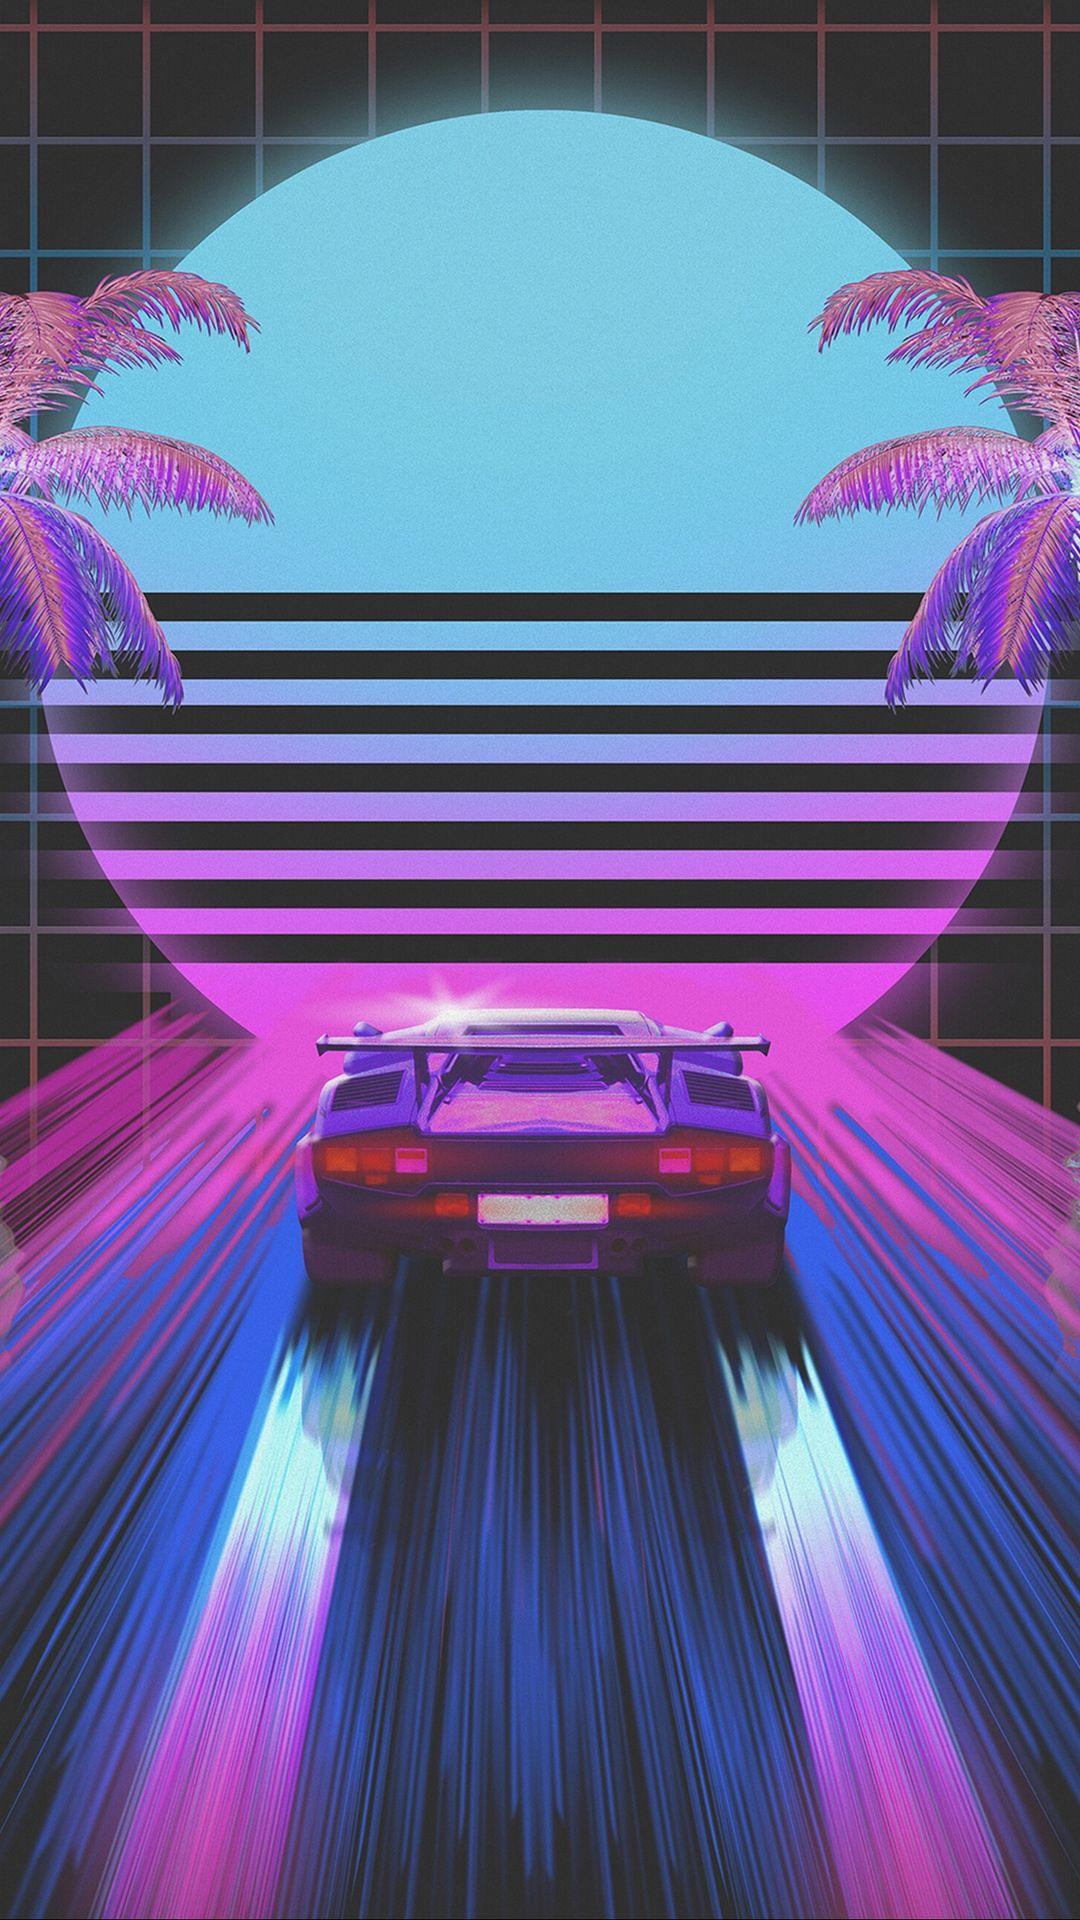 car, retro, art, 80s, neon